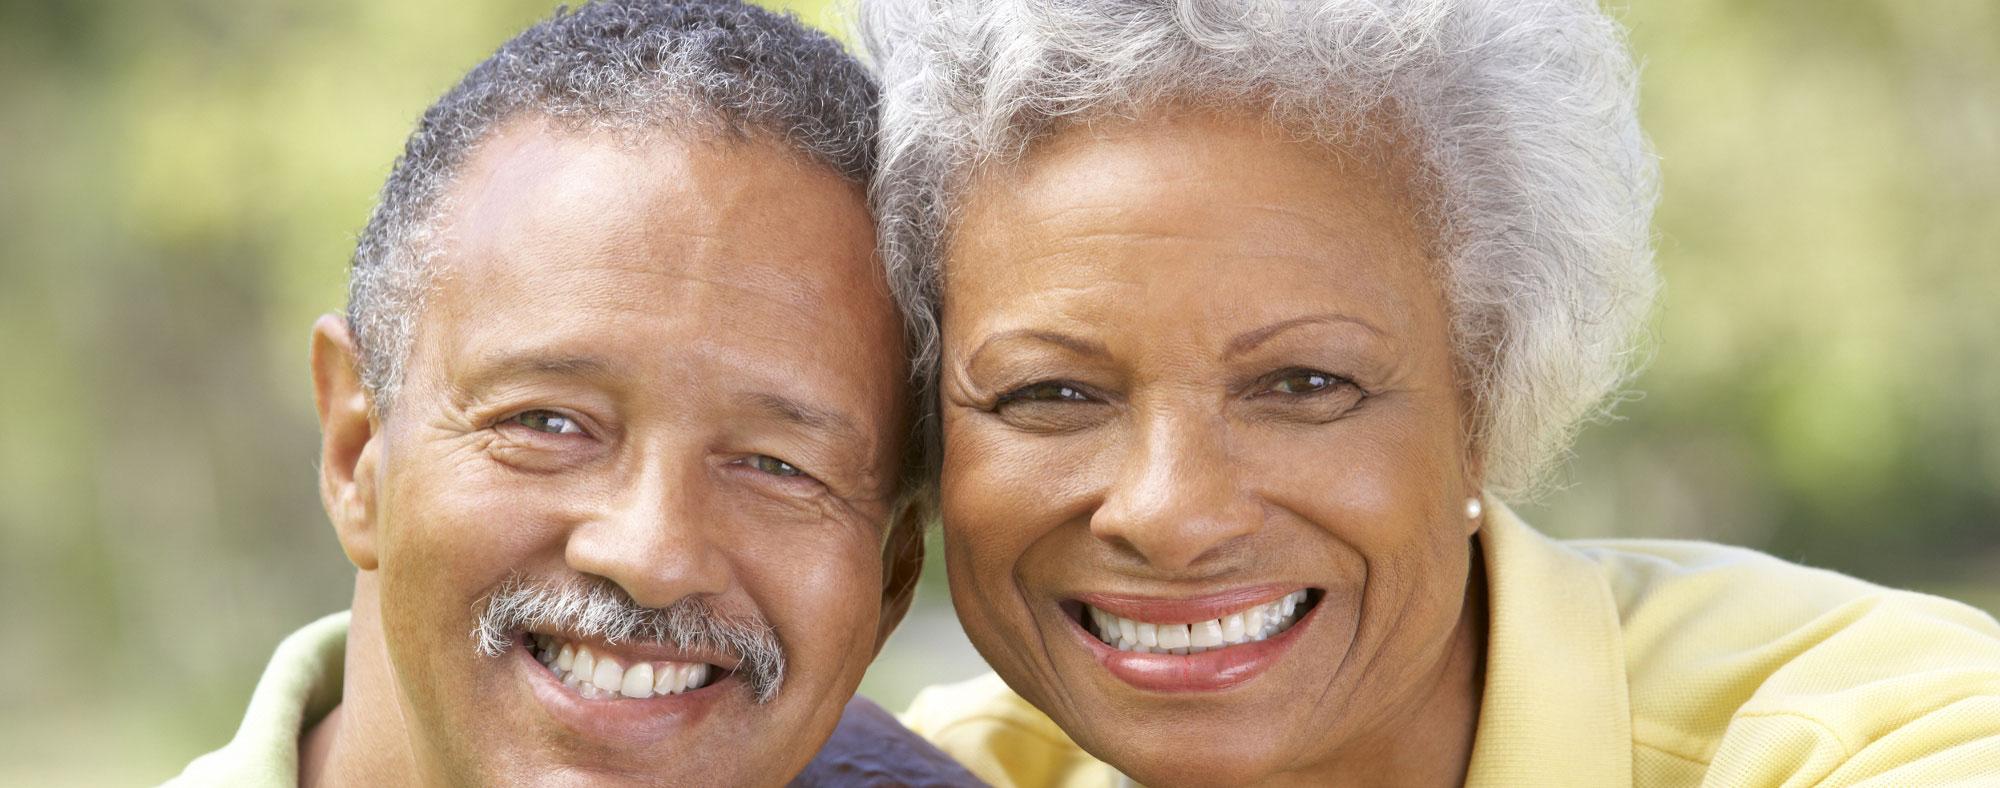 Senior African American Couple